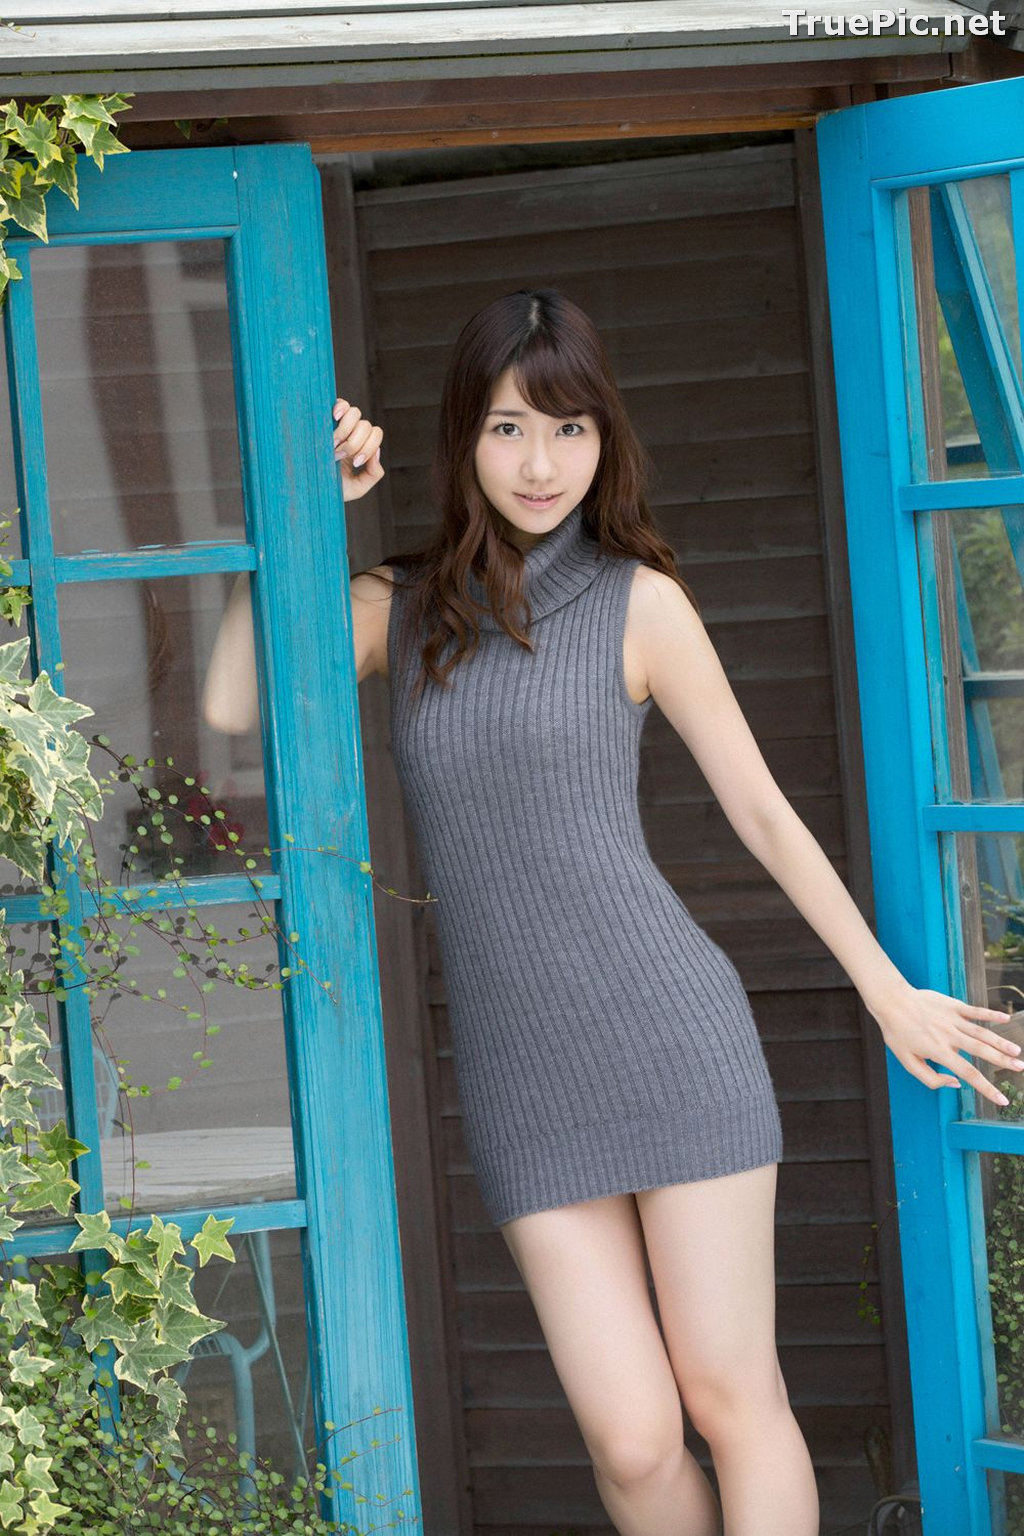 Image YS Web Vol.633 - Japanese Model - Yuki Kashiwagi & Anna Iriyama - TruePic.net - Picture-2